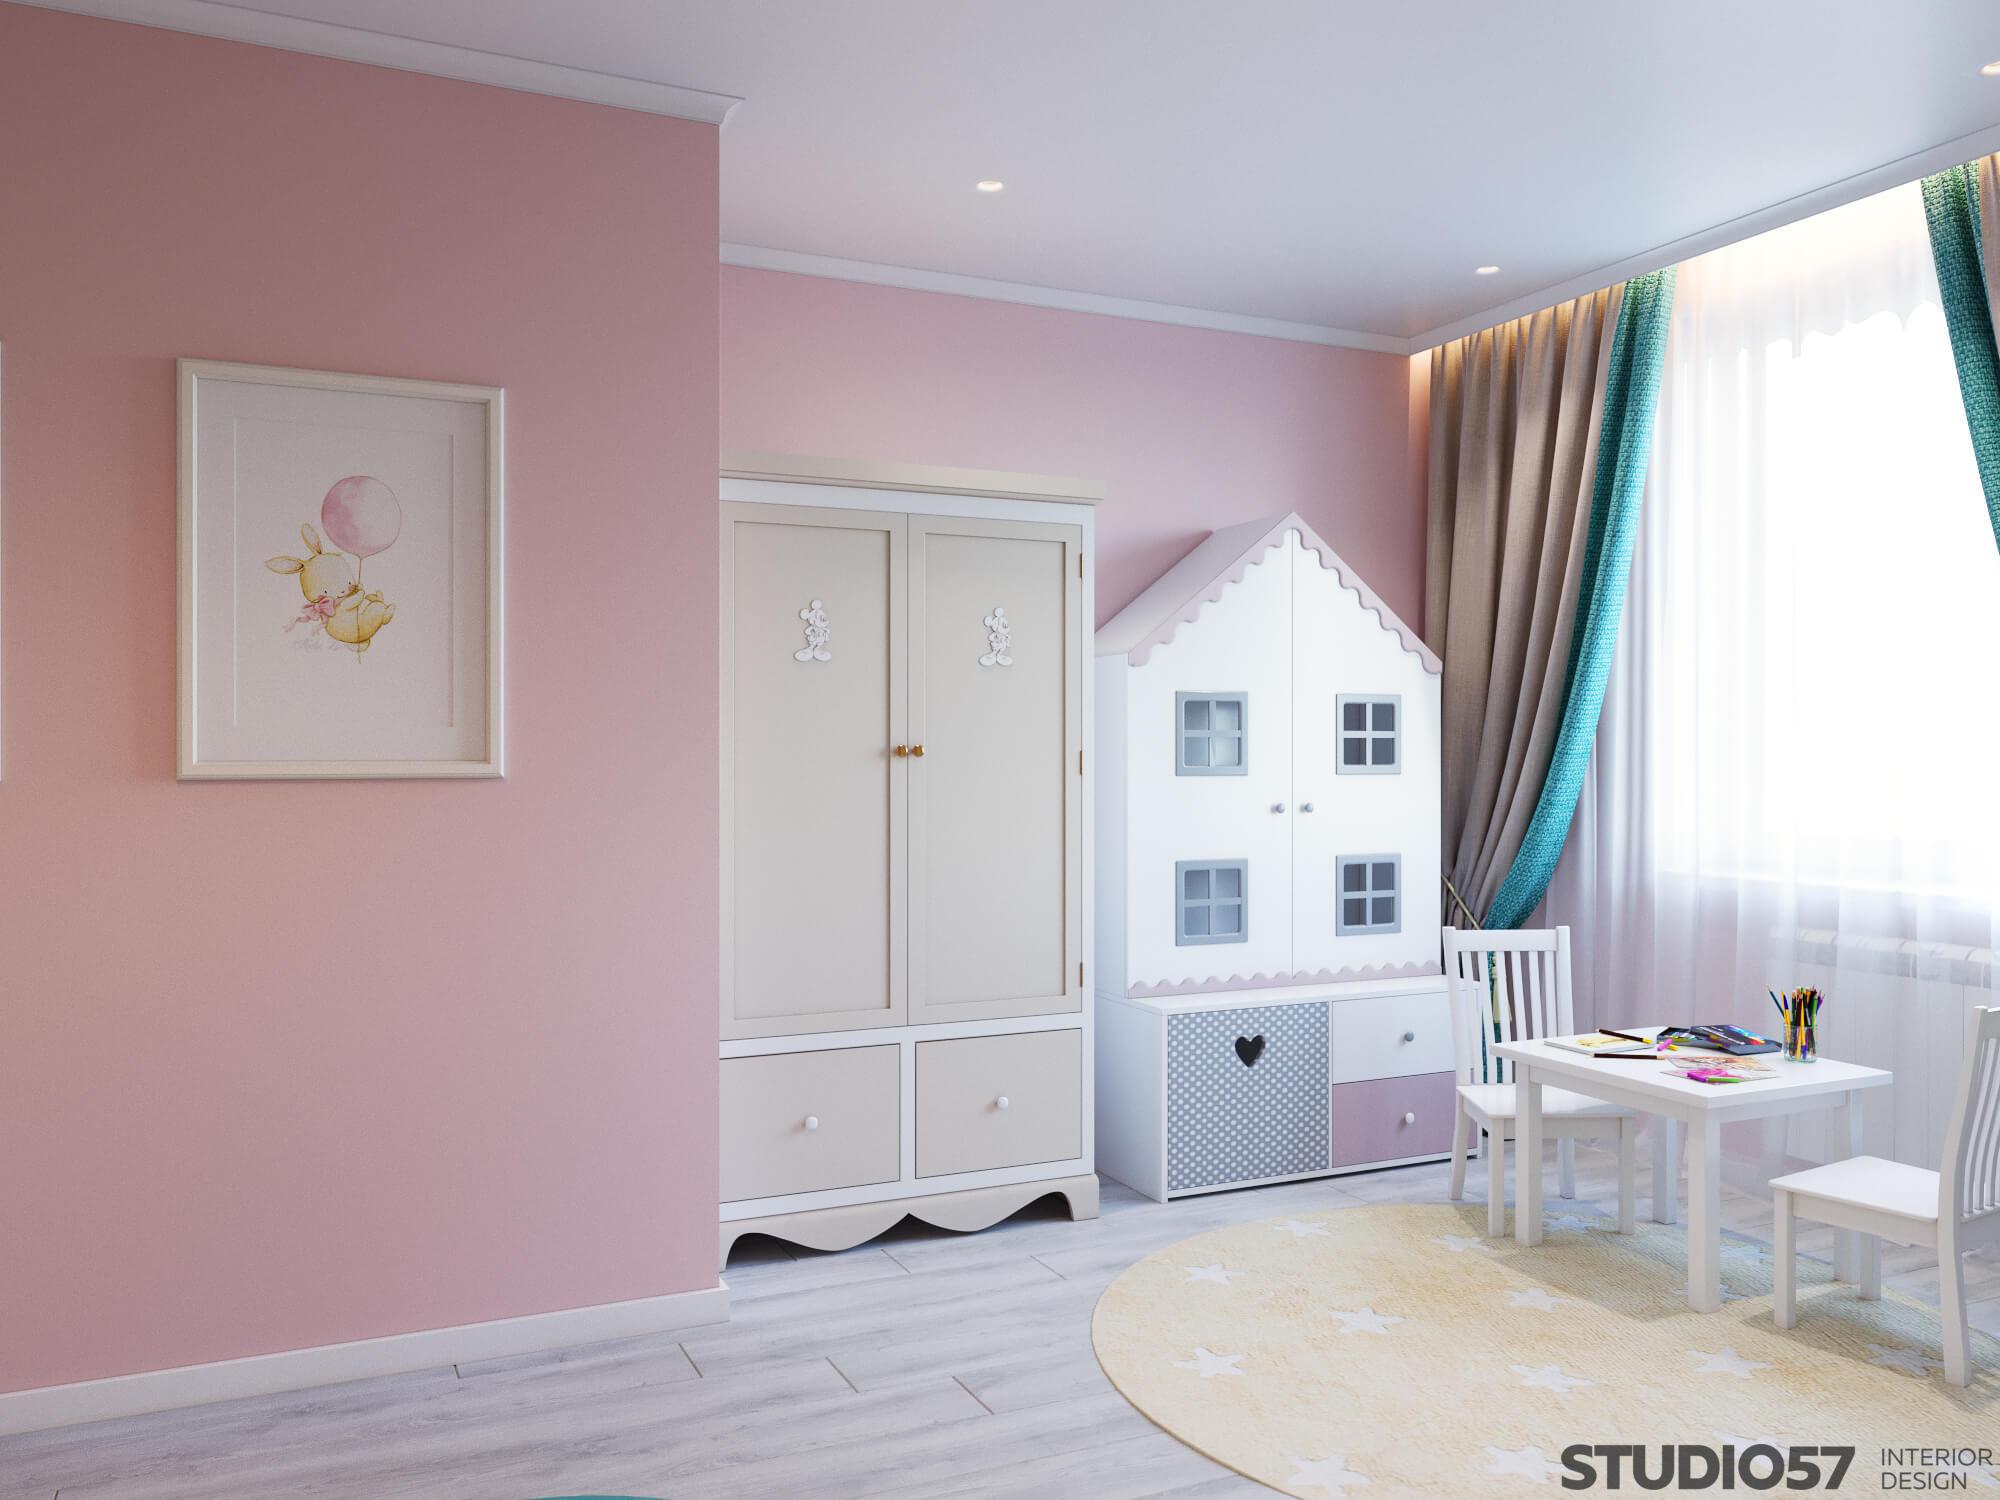 Photo of a pink nursery